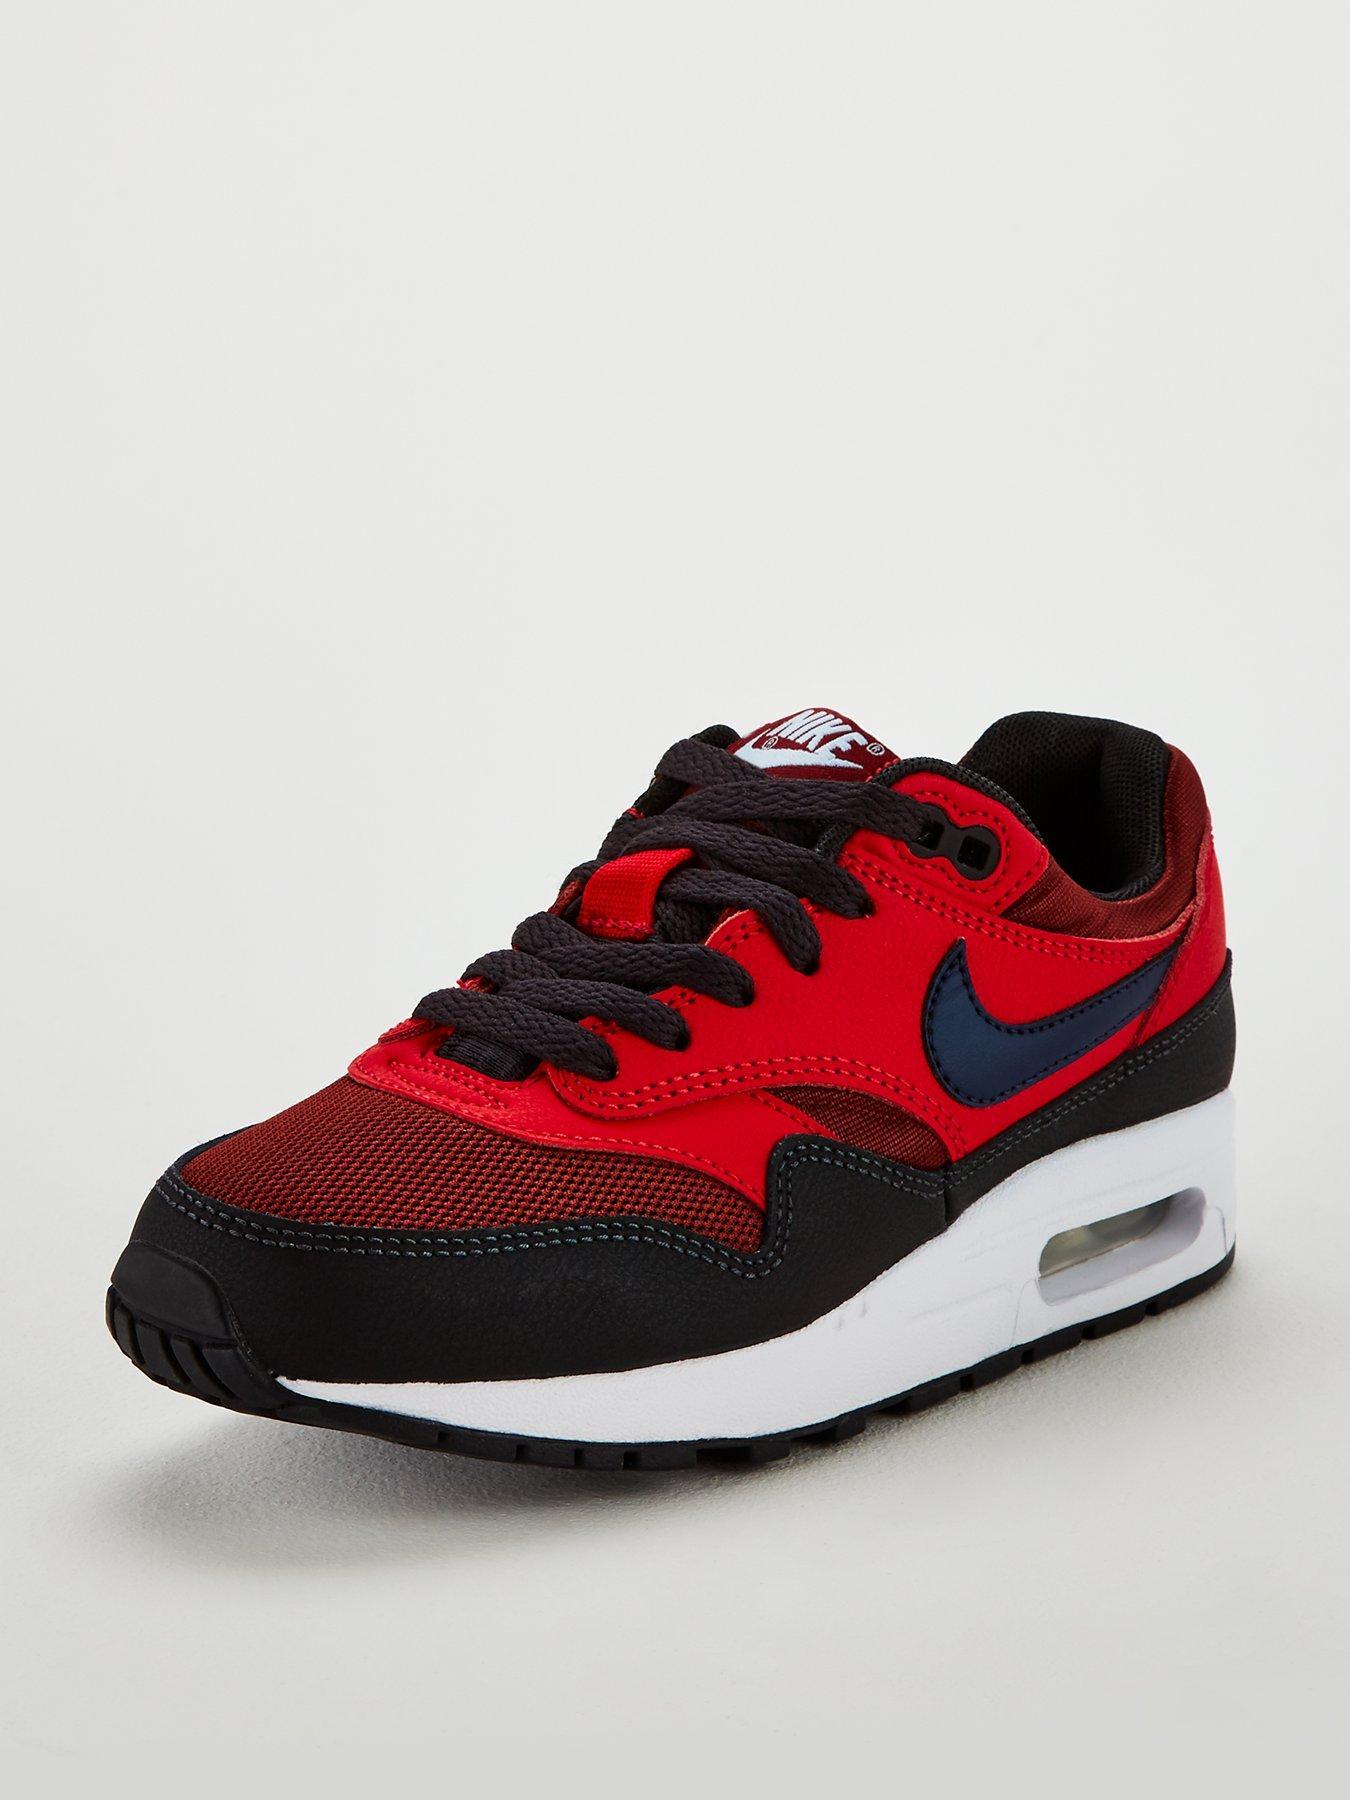 online store 158f6 f39b9 ... coupon code for nike air max 1 junior trainers redblack b4adb de586